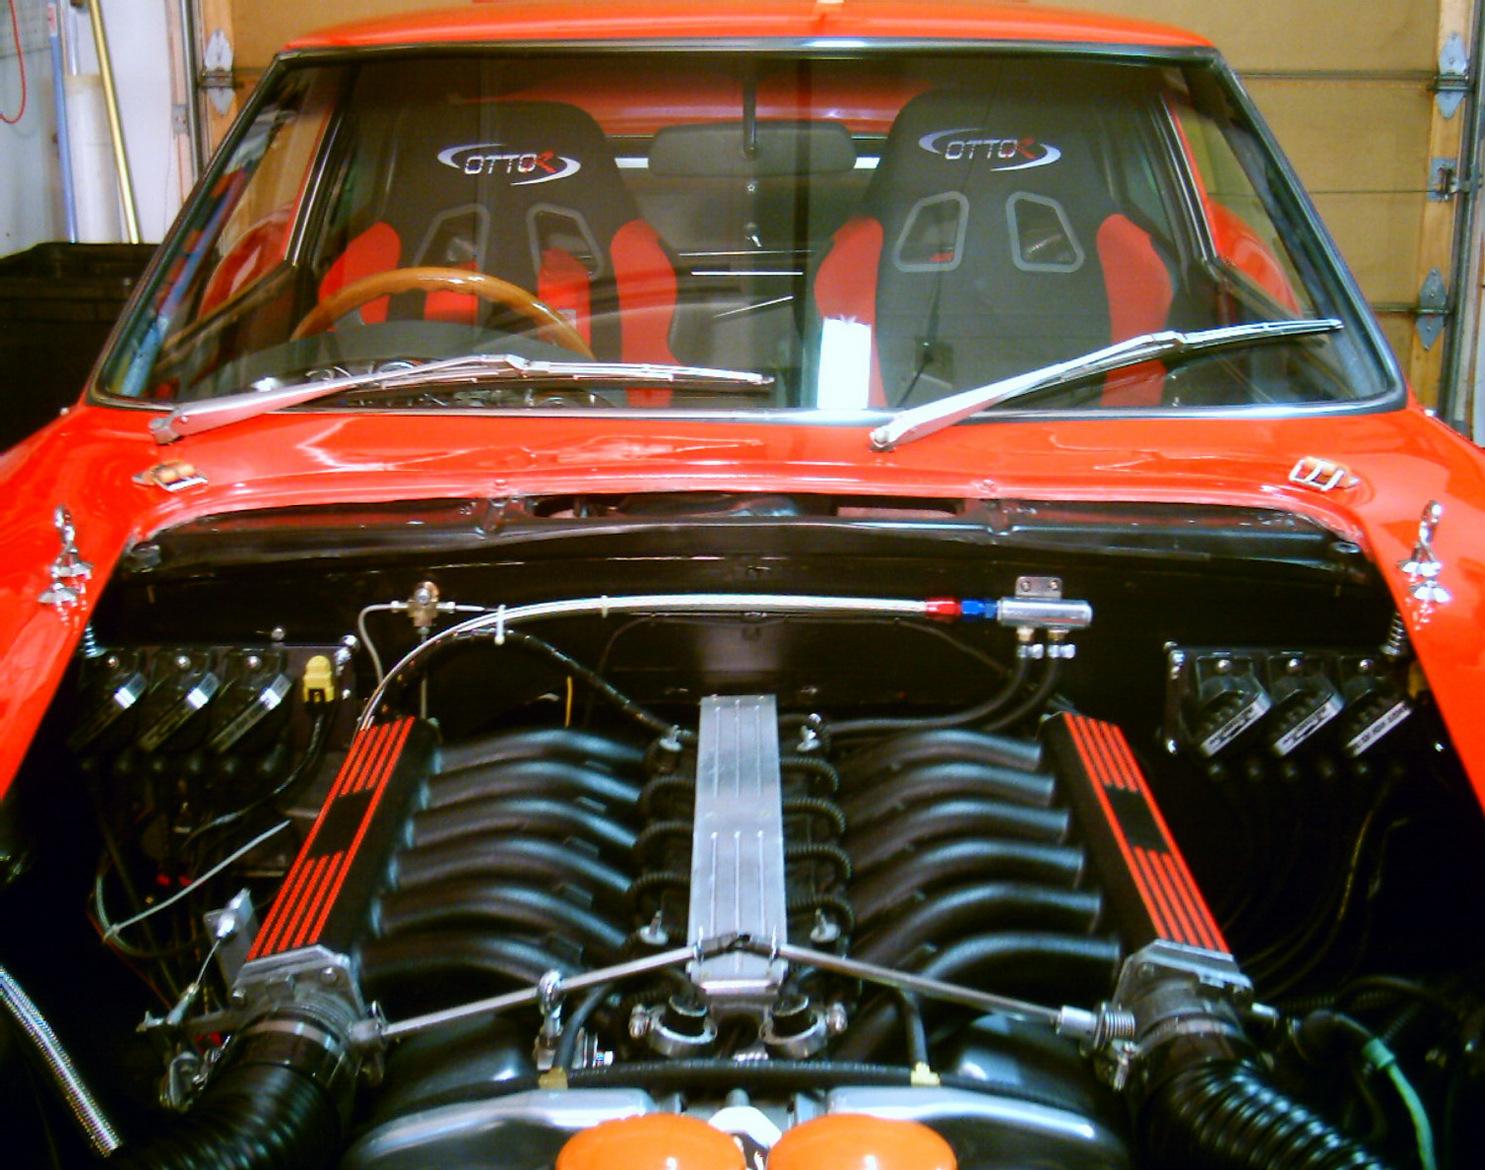 bmw v12 engine diagram s70    v12    into 240z ferrari 250gto kit car  ignition  s70    v12    into 240z ferrari 250gto kit car  ignition